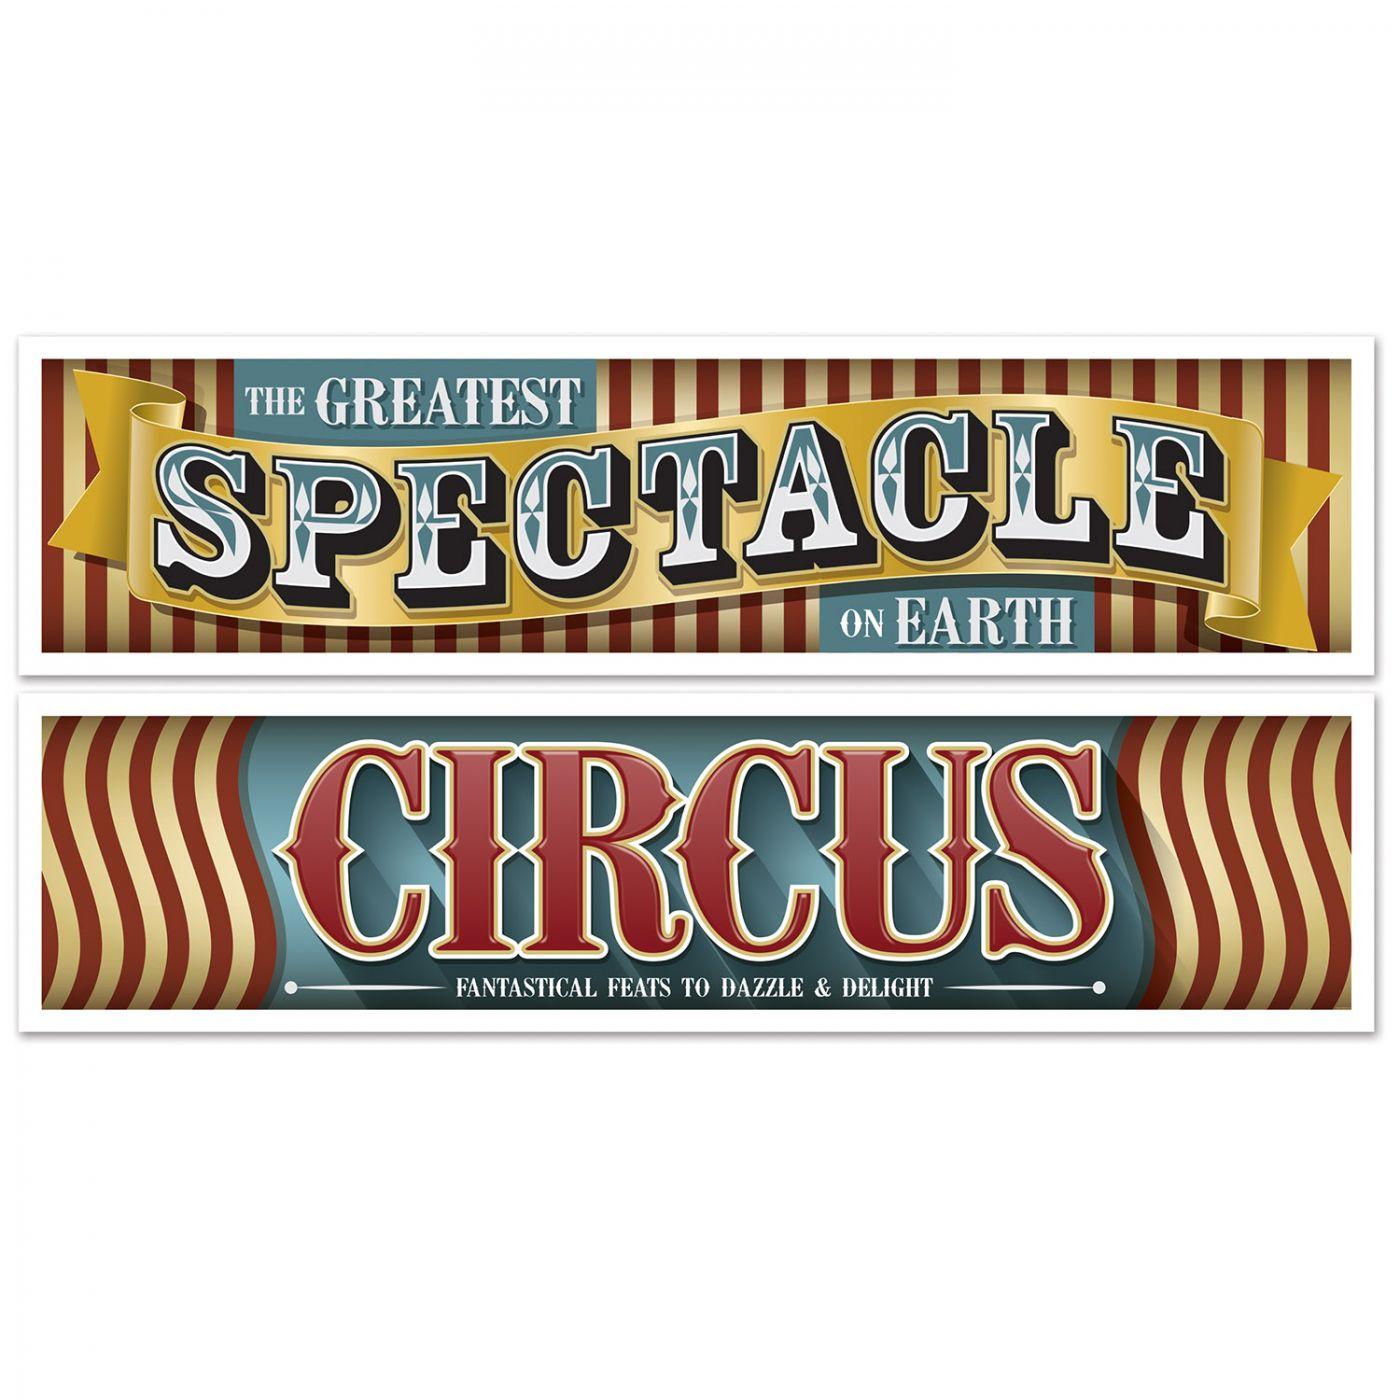 Vintage Circus Banners image